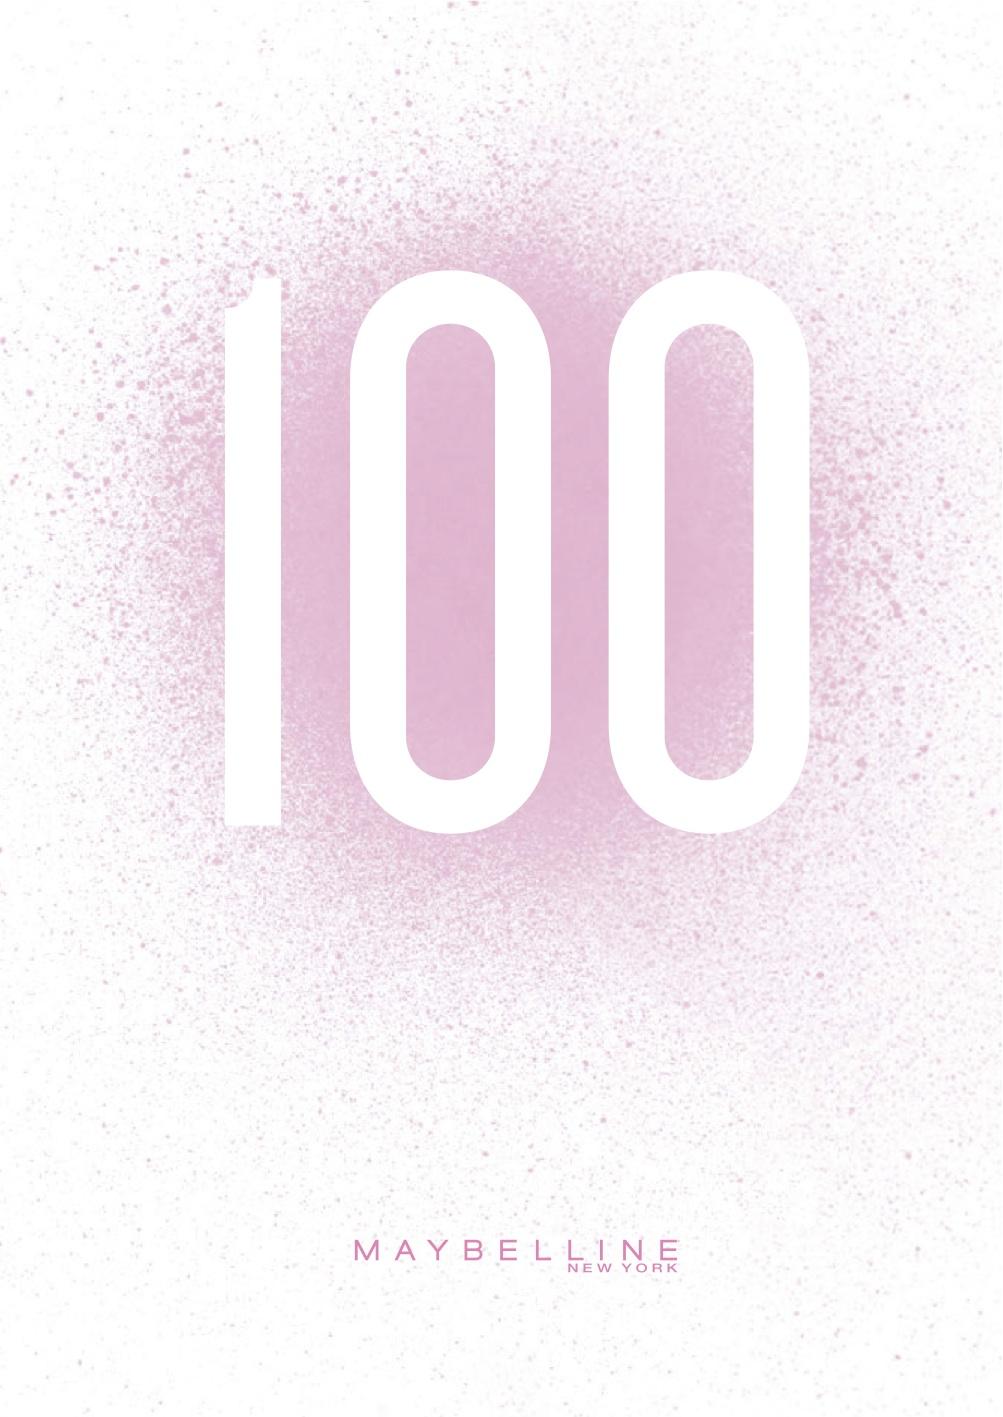 Leaflet_Maybelline 100_forsiden (1)